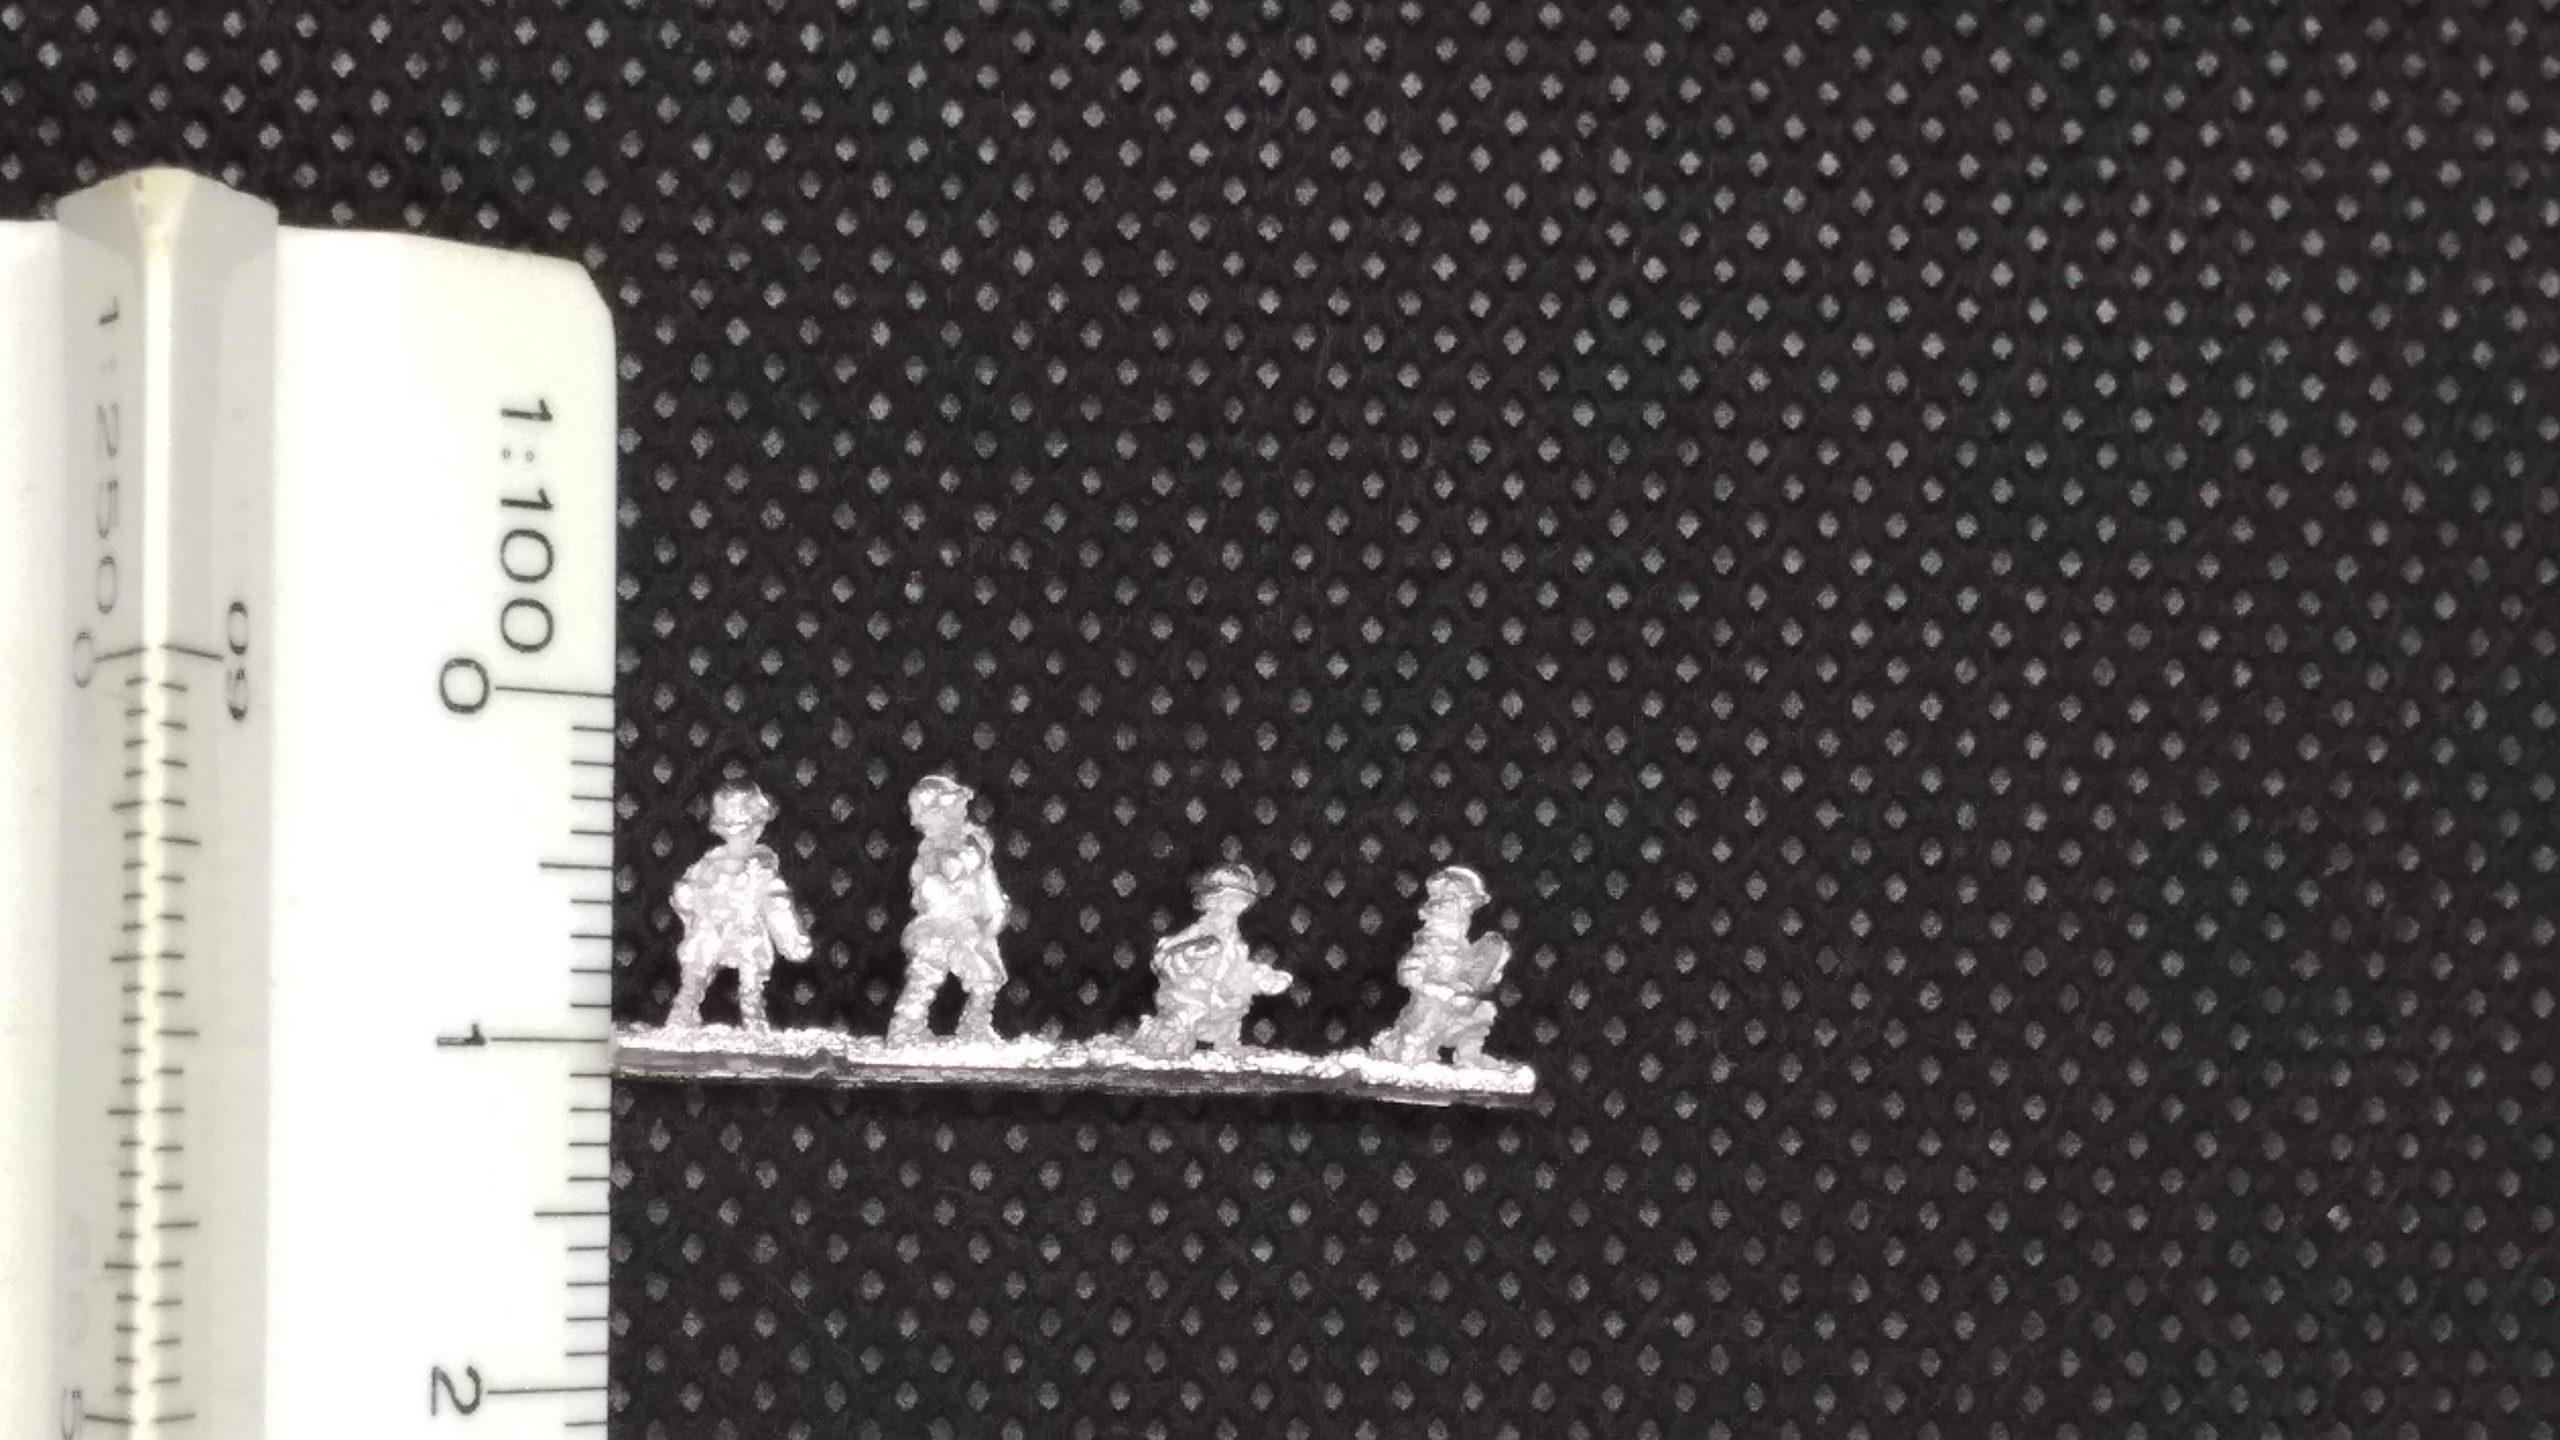 Baccus6mm miniatures size